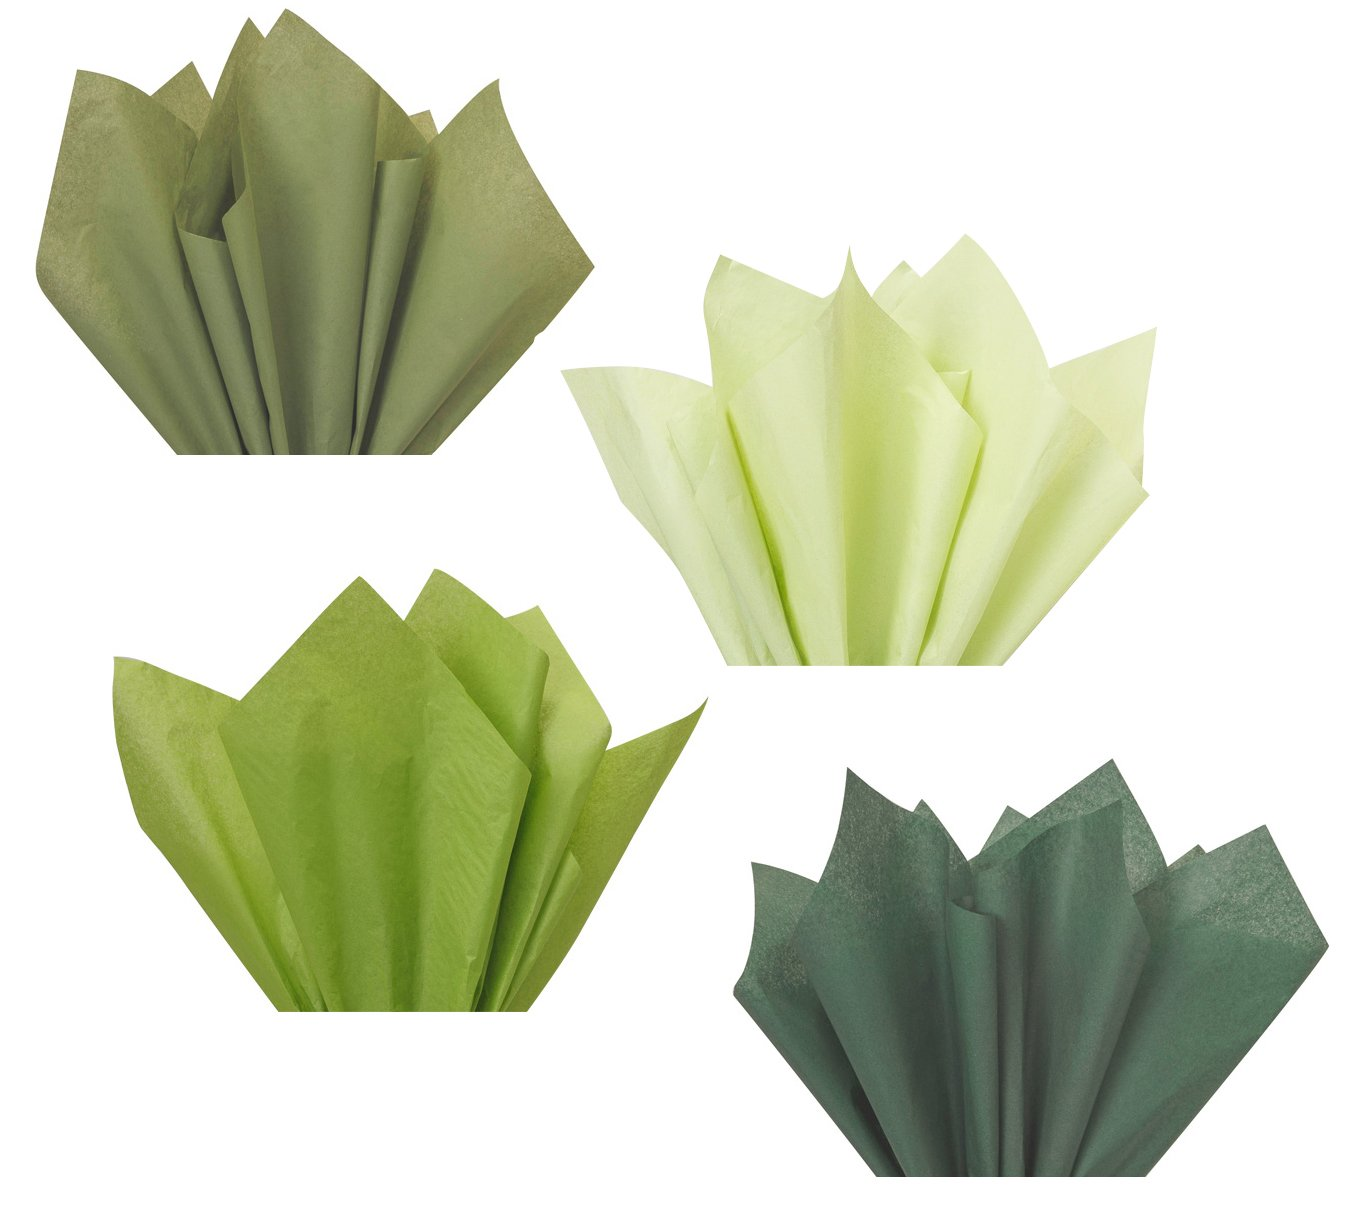 Forest Sage Olive Moss Green Assorted Mixed Color Multi-Pack Tissue Paper for Flower Pom Poms Art Craft Wedding Bridal Shower Party Gift Bag Basket Filler Decoration by Secret for Longevity